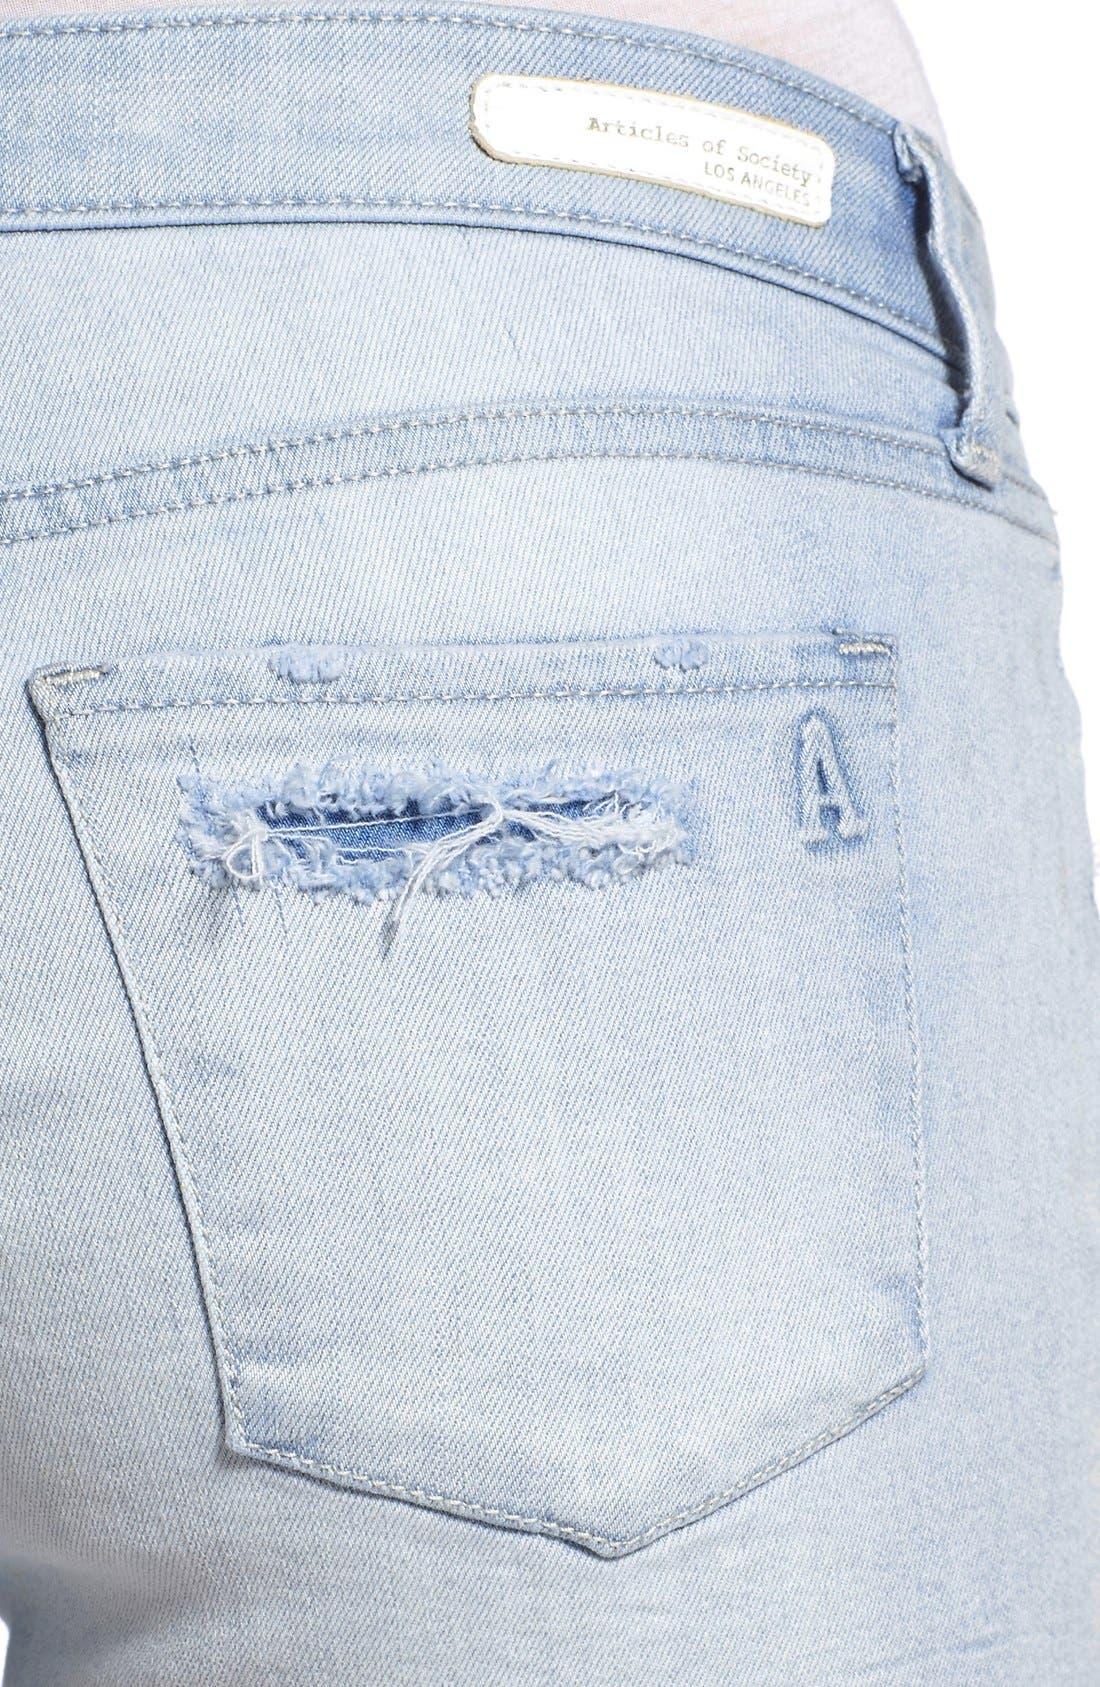 Alternate Image 5  - Articles of Society 'Madre' Denim Shorts (Cozumel)